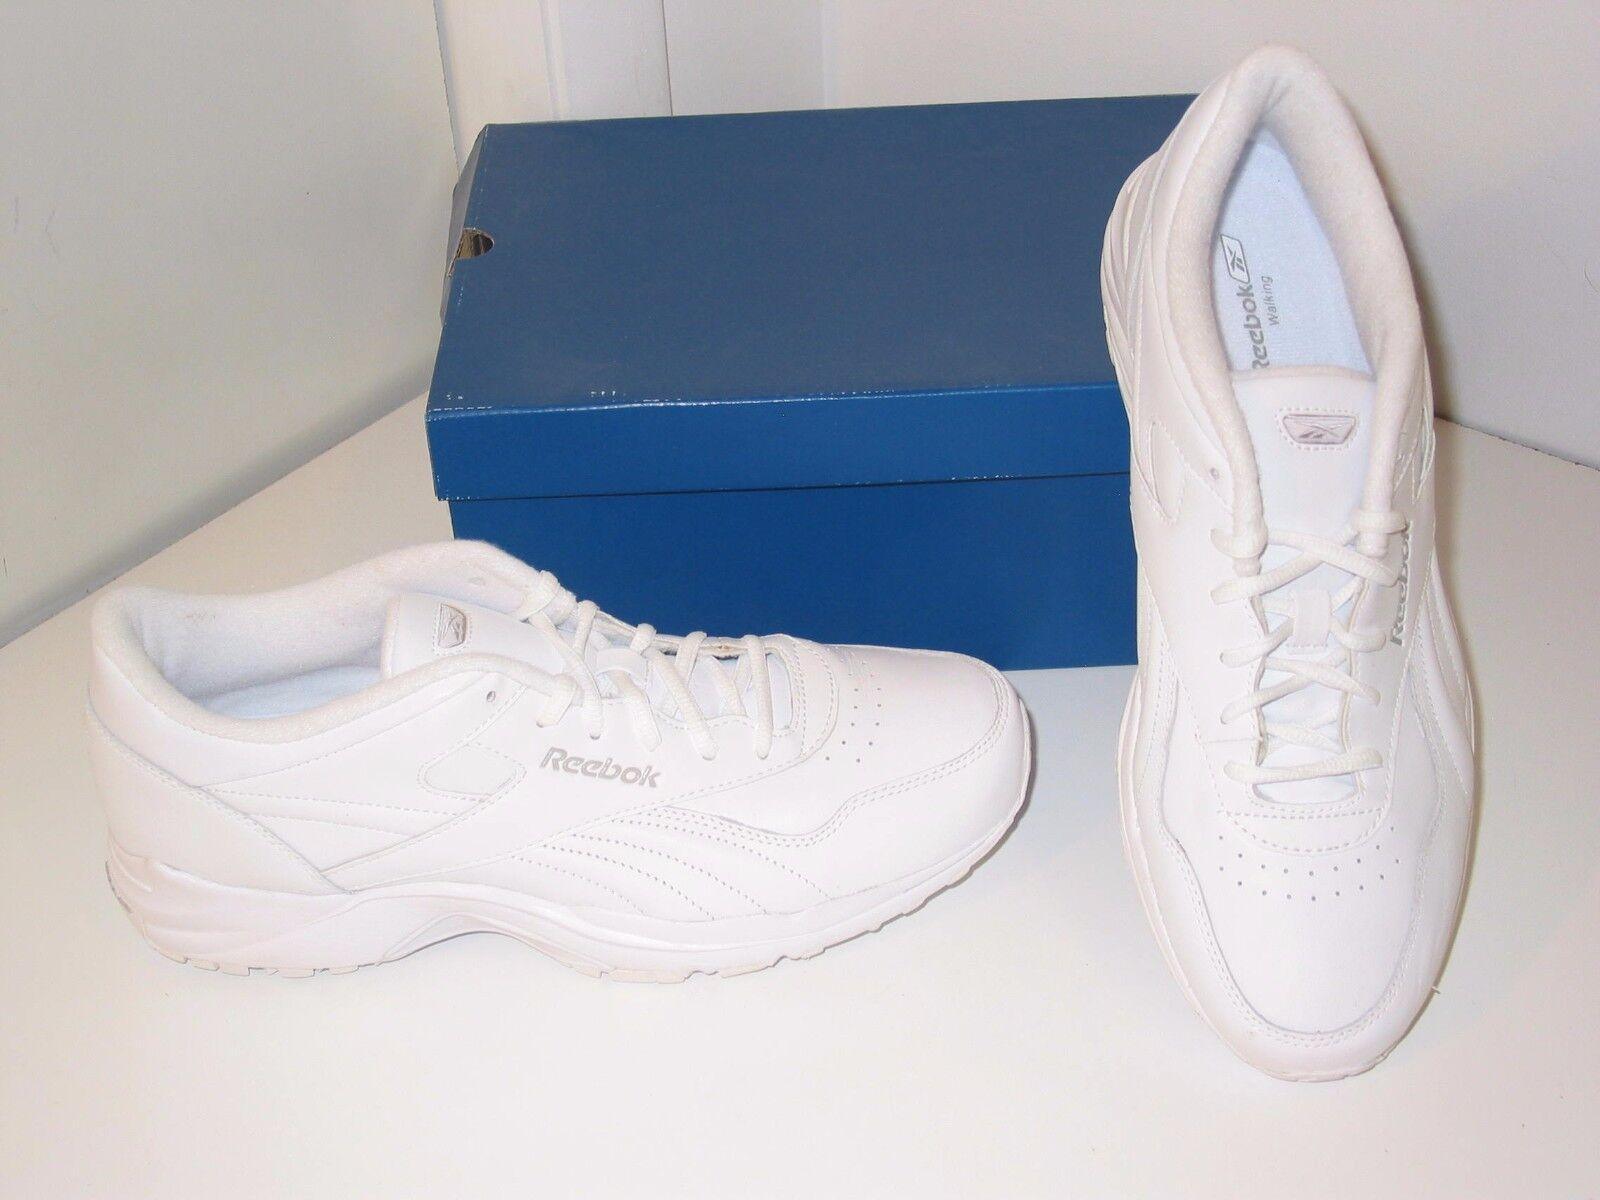 Reebok Comfort Deluxe DMX Walking WEISS Leder Casual Sneakers Schuhes Damenschuhe 12